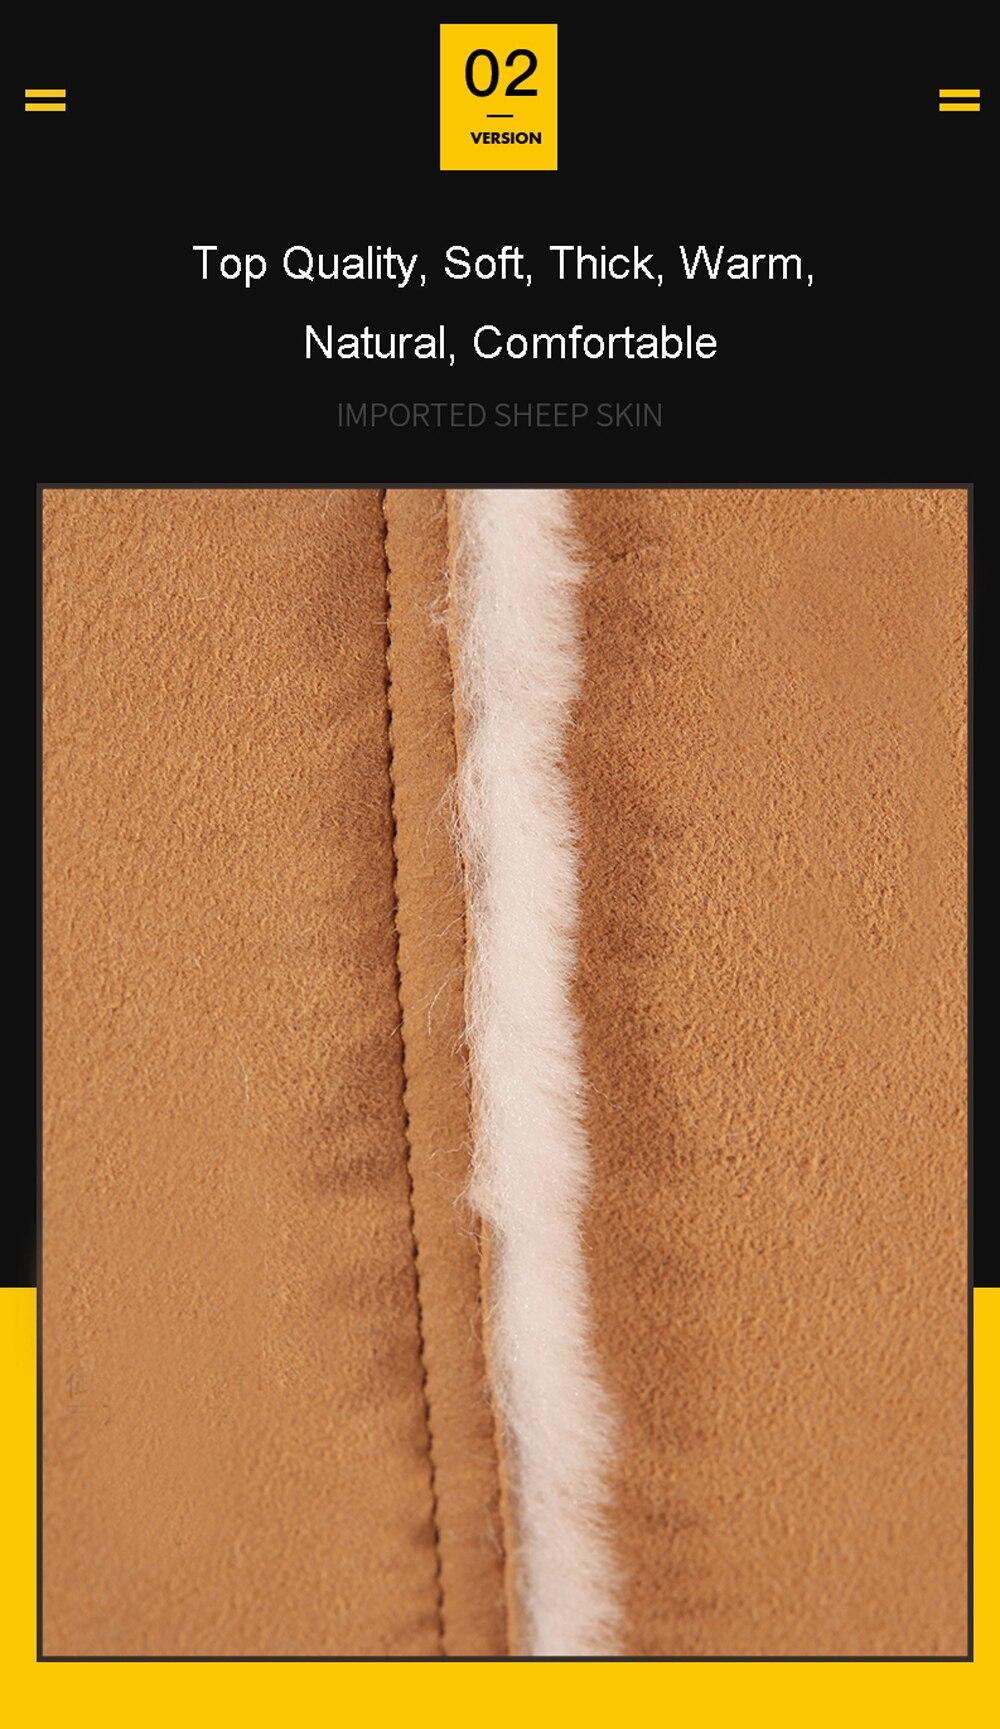 H045589ef59b544cb8a9076ae374d78878 Men Luxury Fur Shearling Coat Yellow Soft Thicken Fur Coat Winter Male Formal Business Fur Sheepskin Jackets